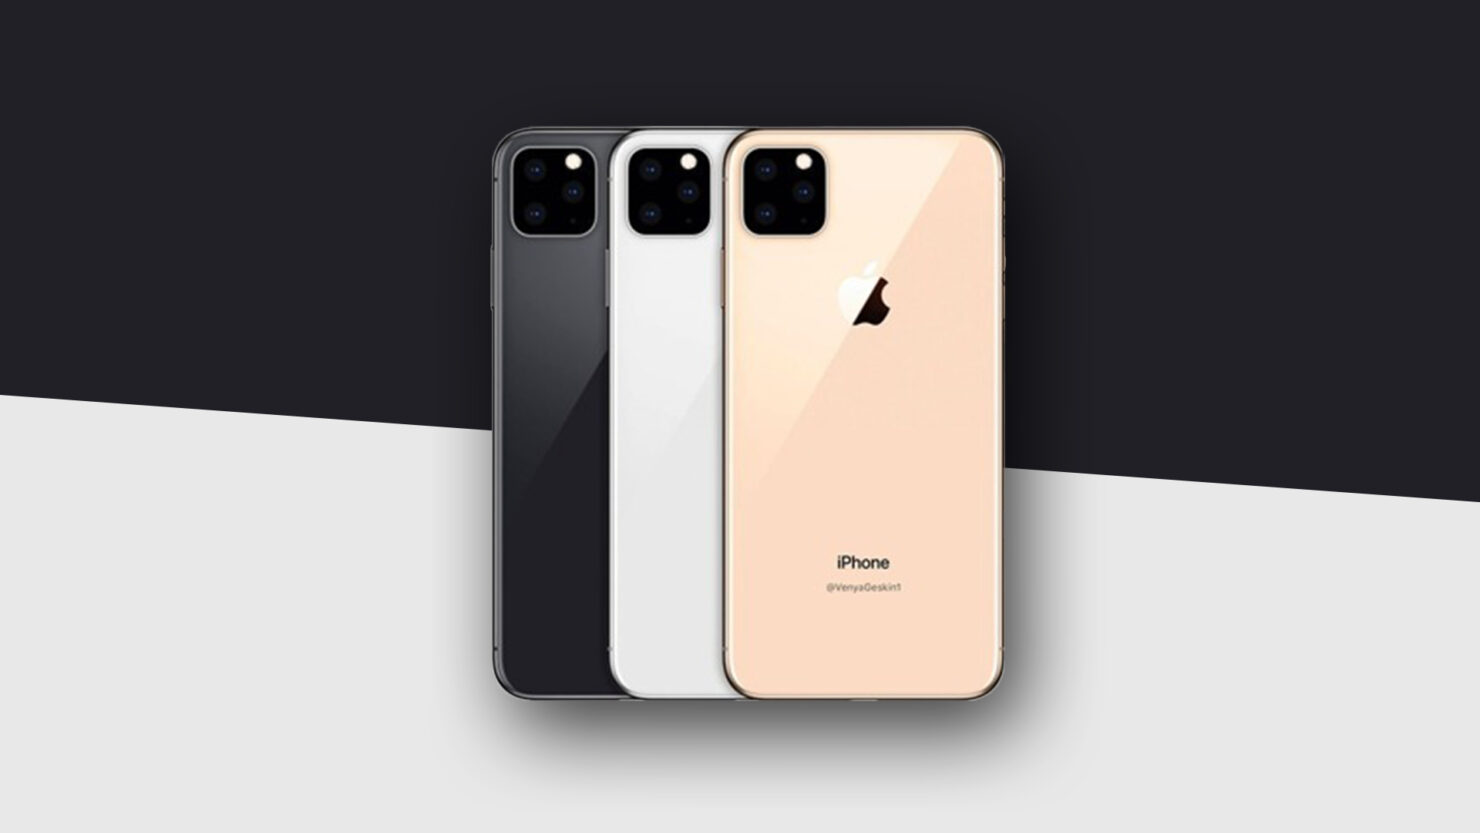 Apple iPhone business slowdown 2019 Credit Suisse